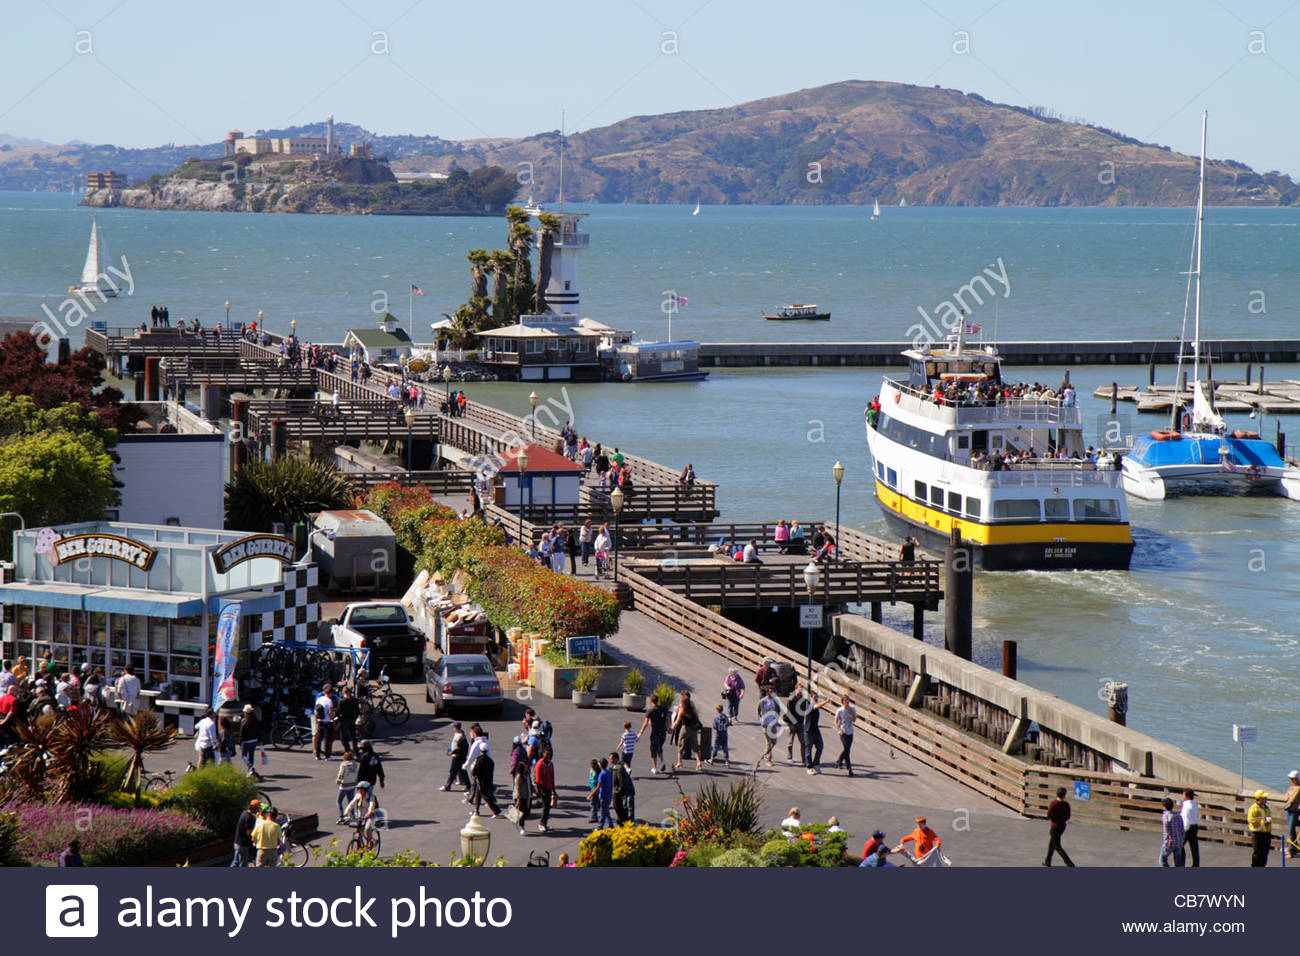 San Francisco California Bay Alcatraz Angel Island Mount Livermore mountain The Embarcadero Pier 39 41 dock waterside - Stock Image